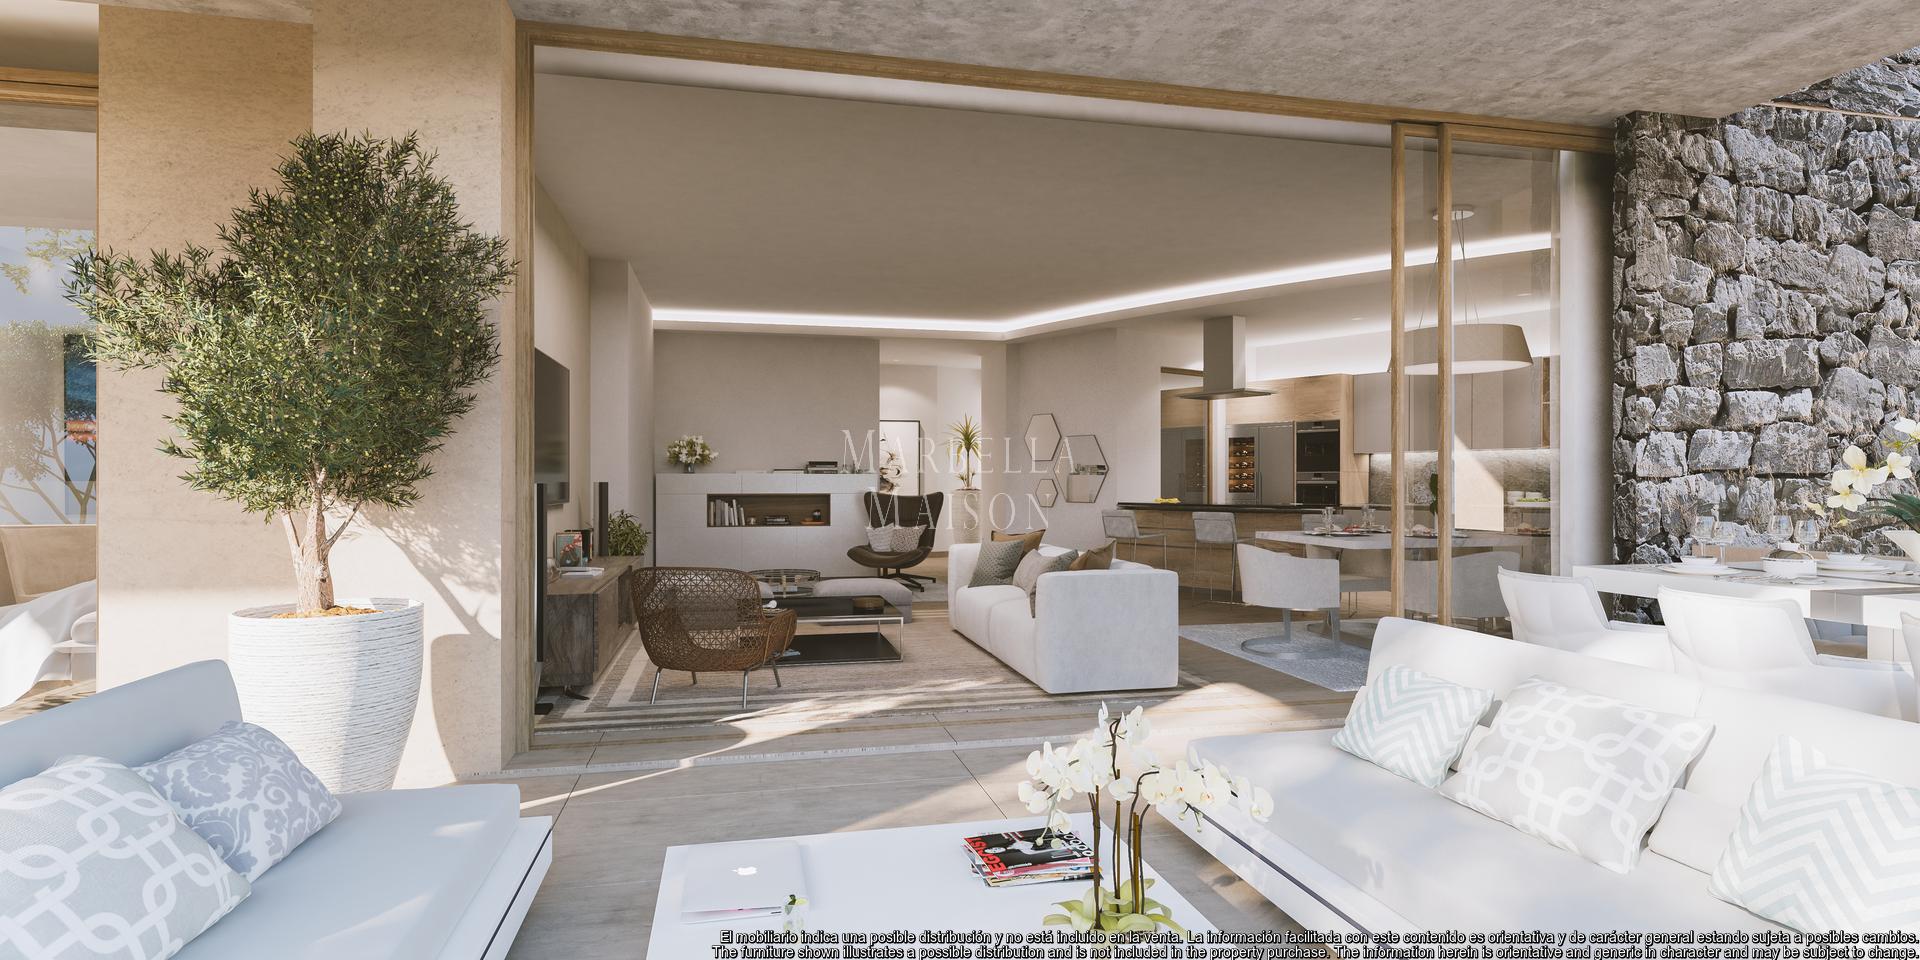 Spectacular apartment in luxurious Resort with panoramic views in Benahavis